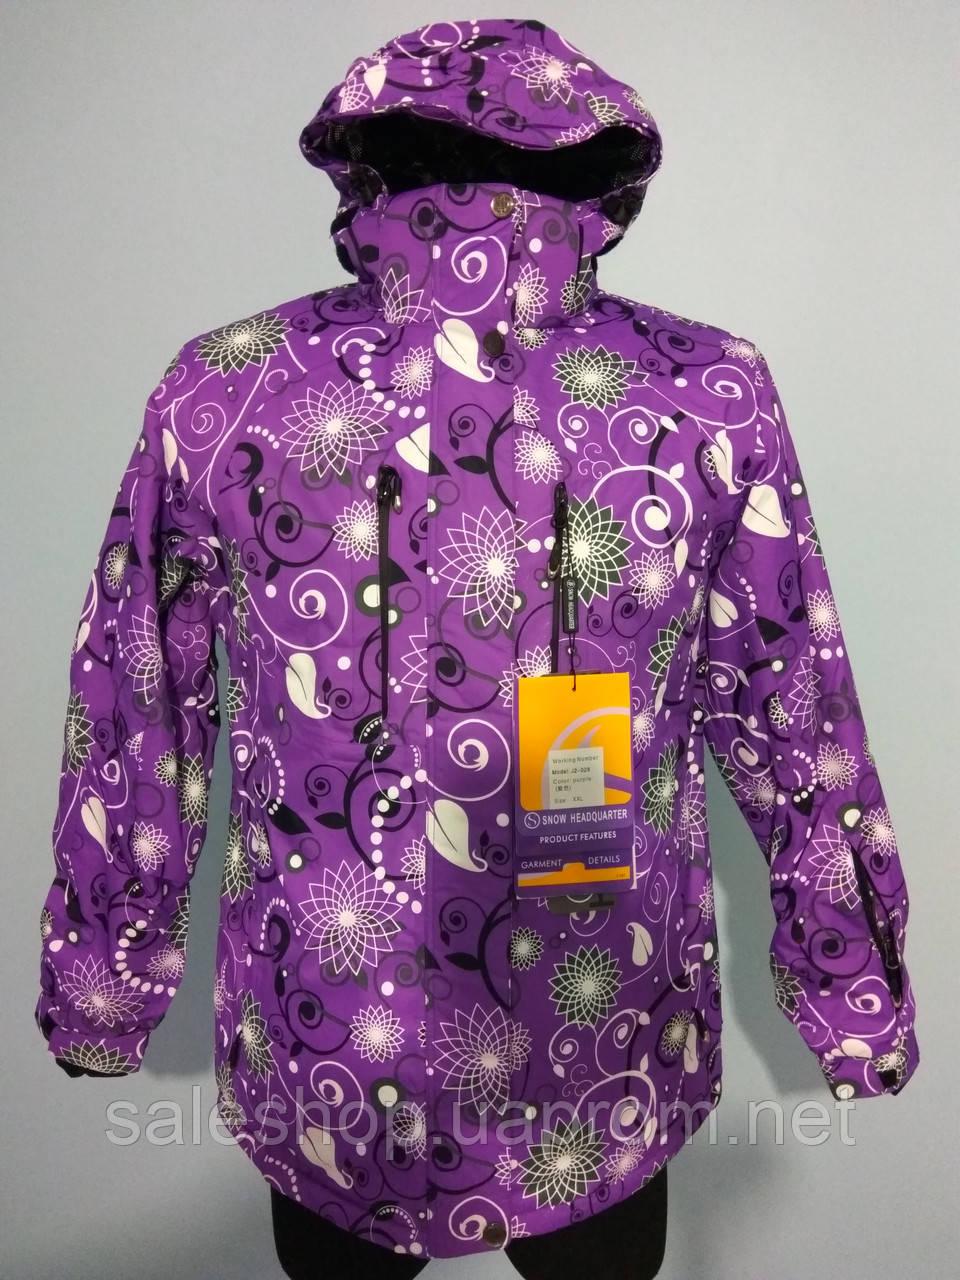 917b68a9b226 Женская горнолыжная (лыжная) куртка Snow headquarter c Omni-Heat, ...